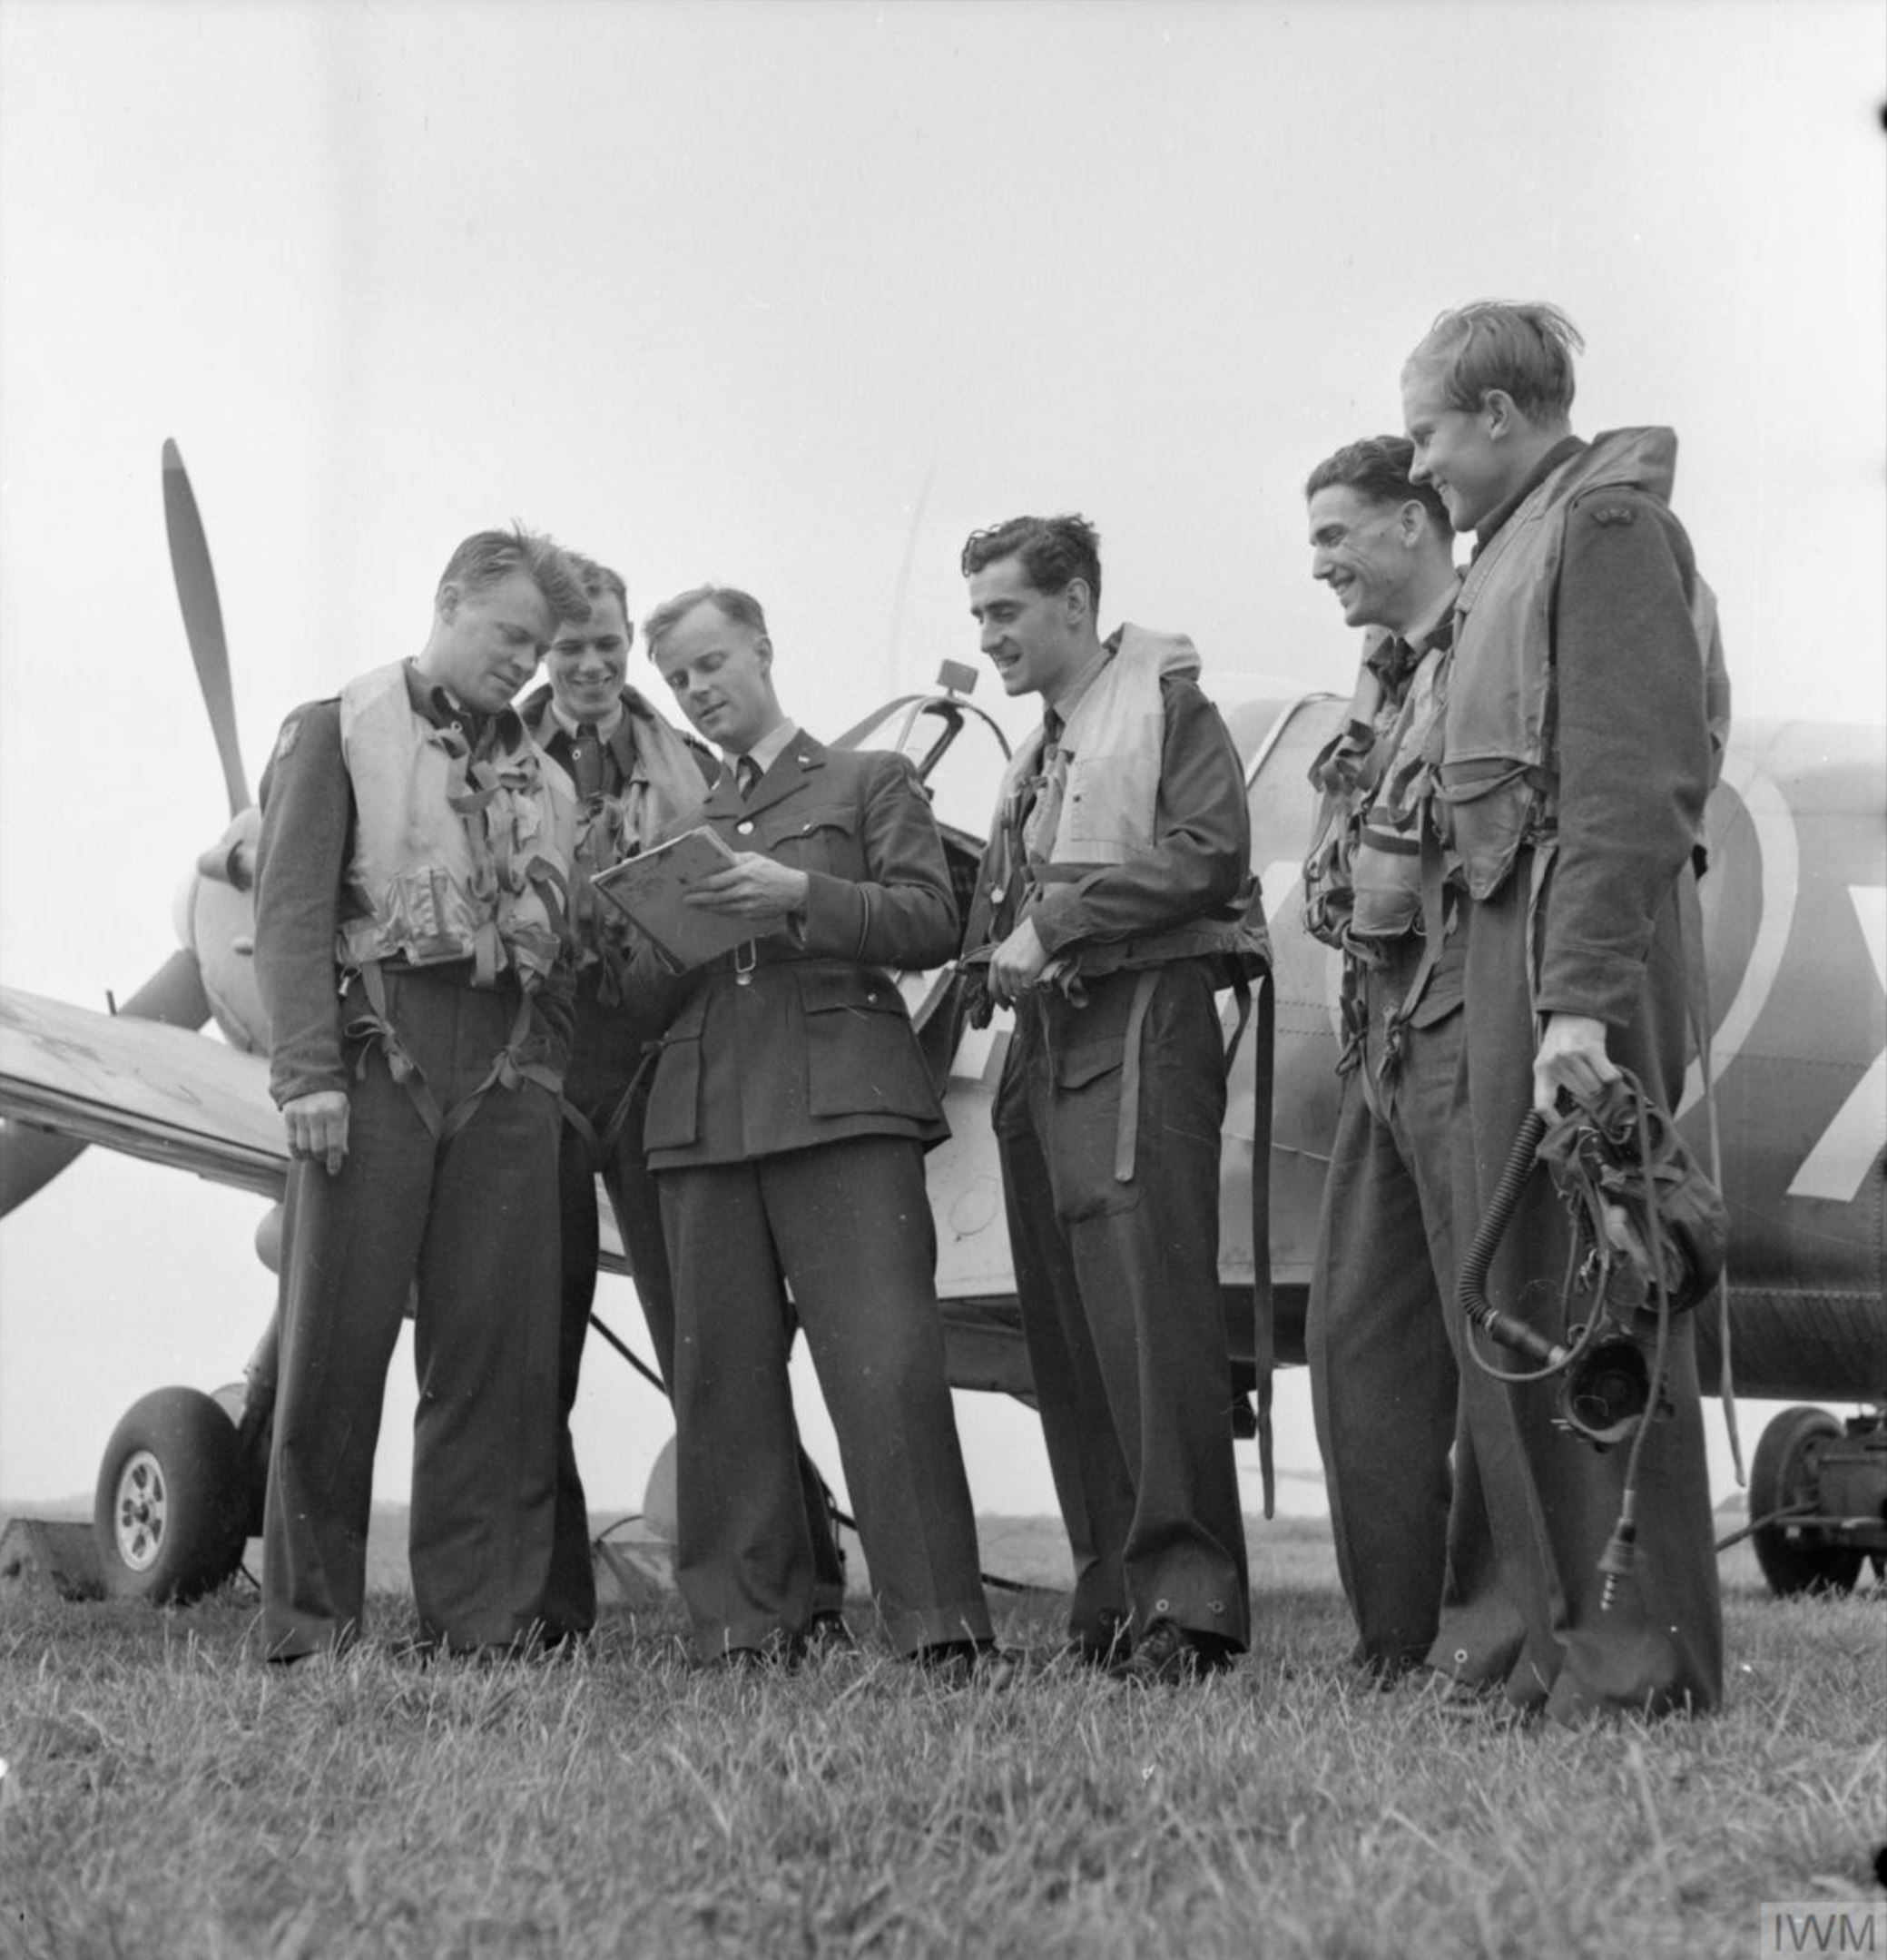 Aircrew RAF 121Sqn at RAF Rochford in Essex Aug 1942 IWM D9520